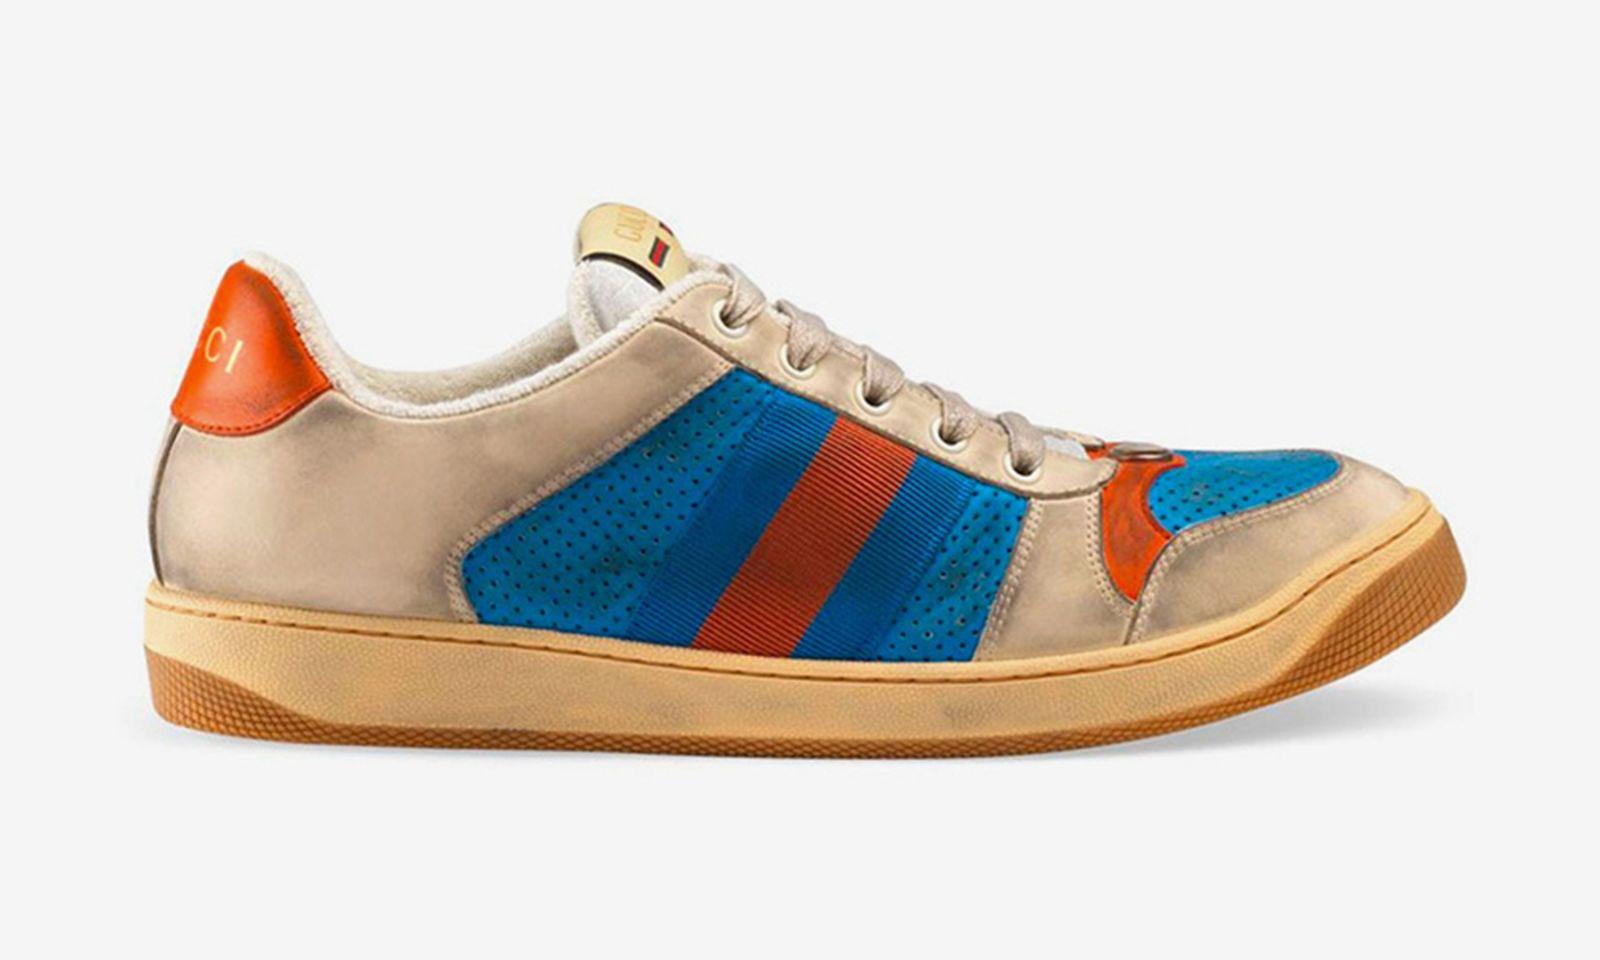 gucci sneakers best comments roundup jeff goldblum pusha t